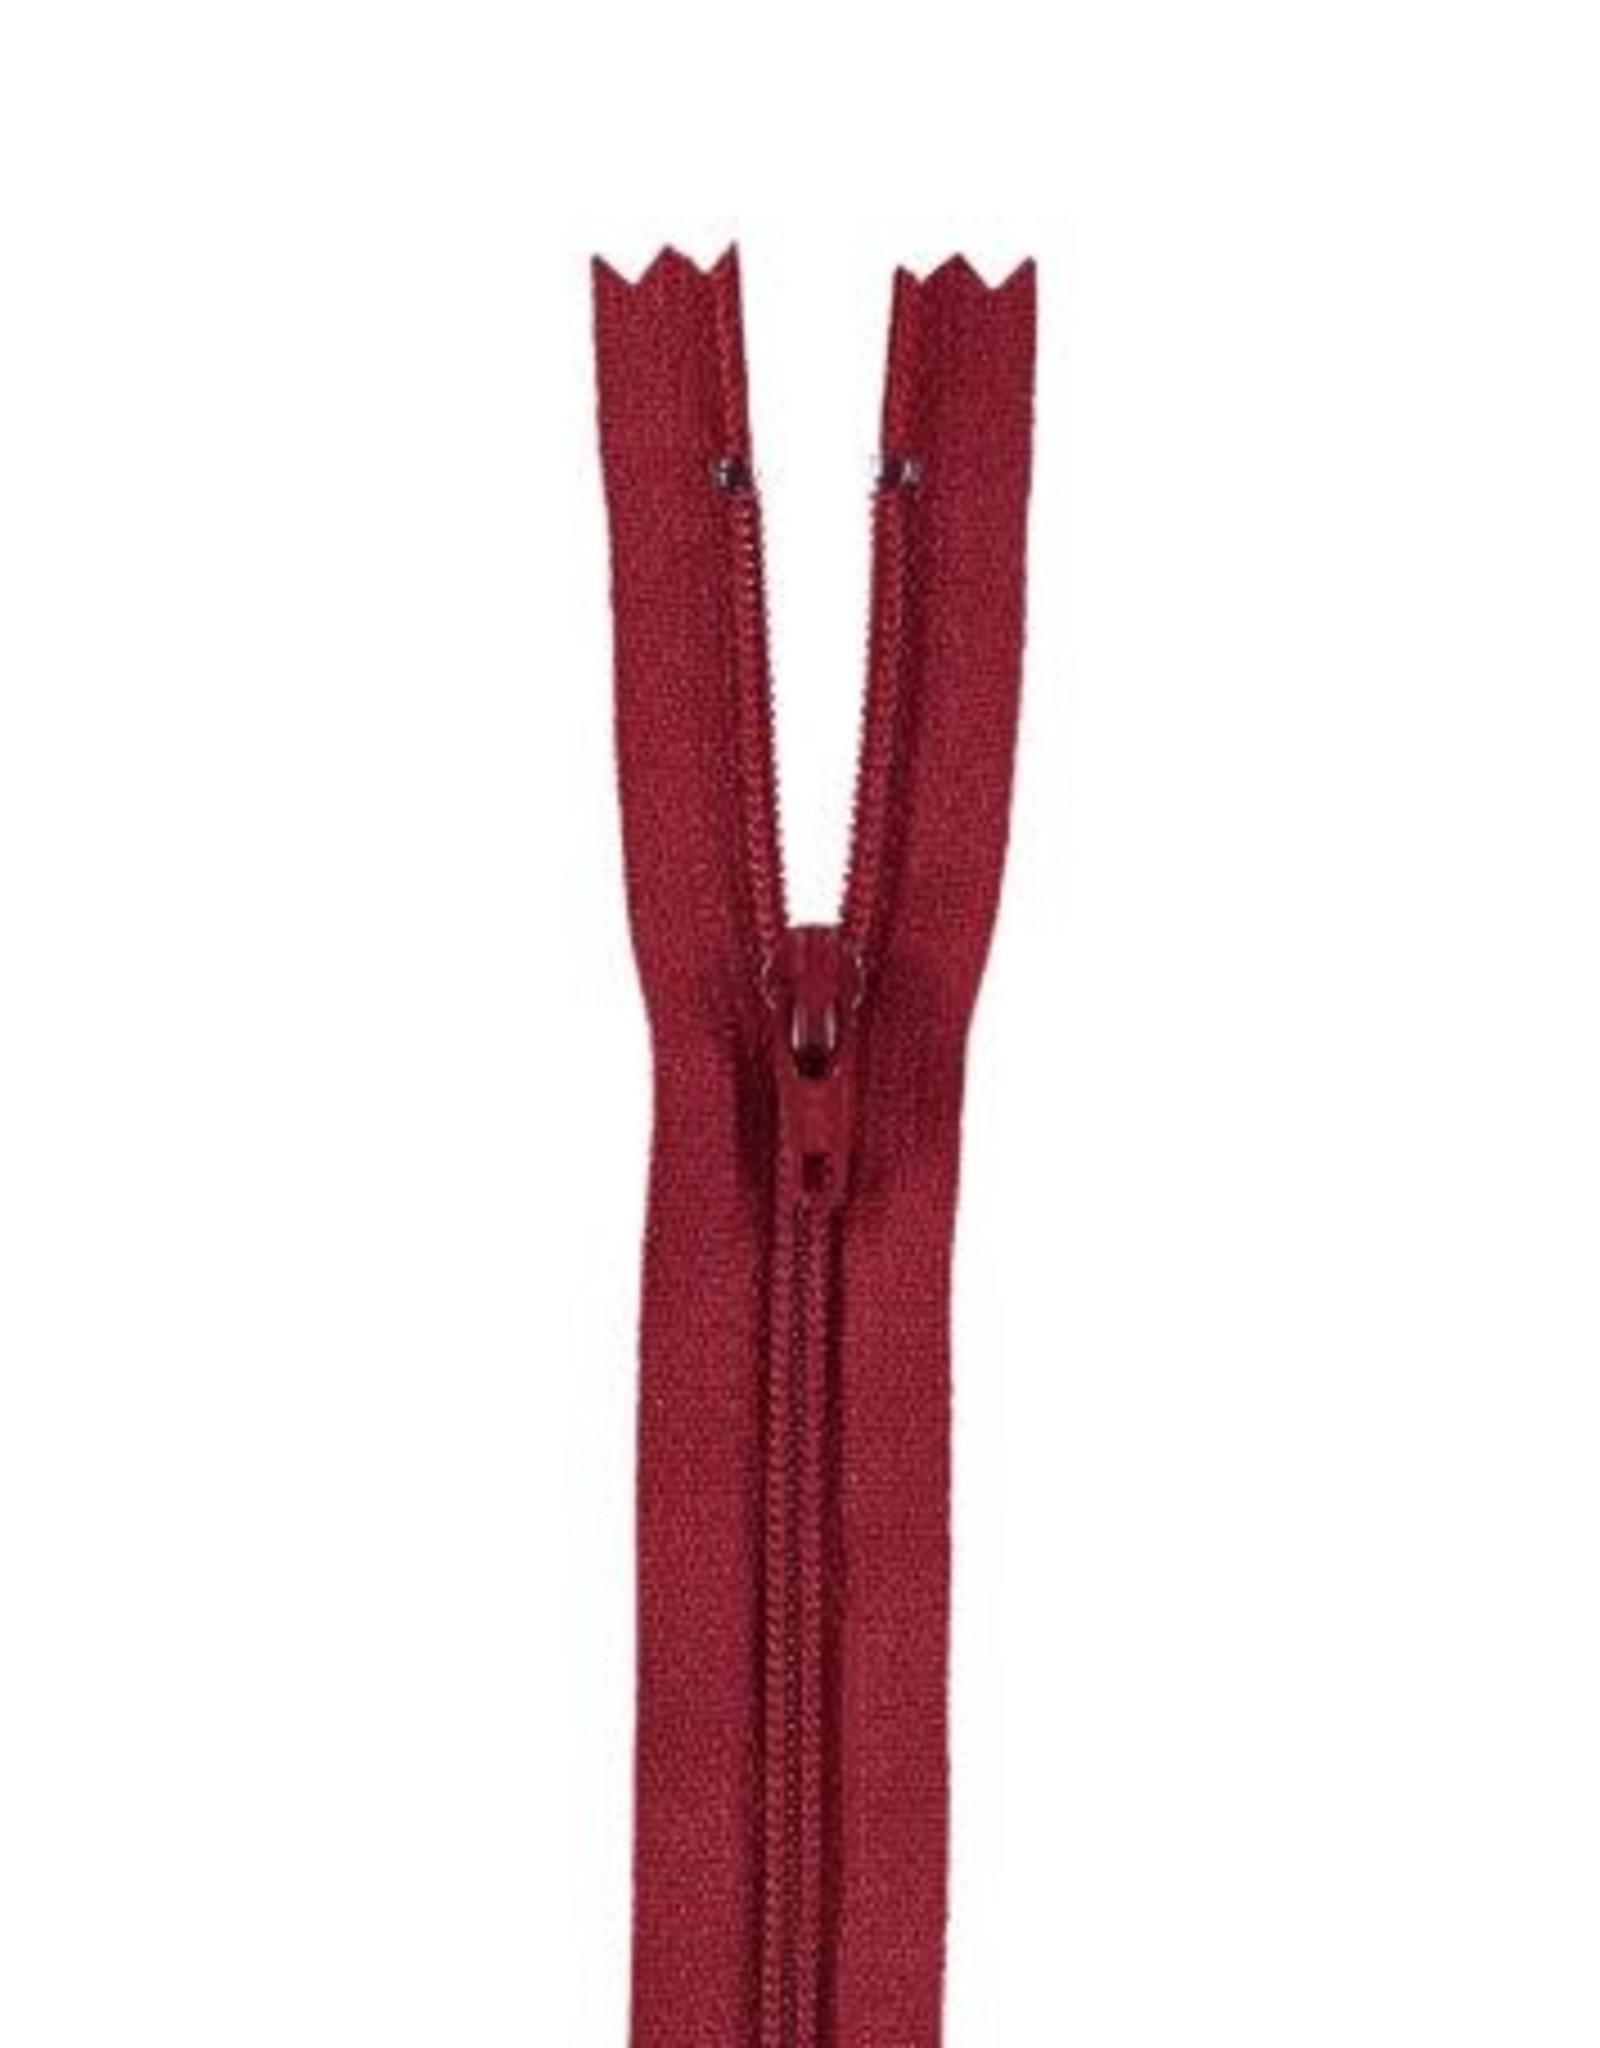 YKK Spiraalrits niet-DB 3mm donker rood 520-12cm